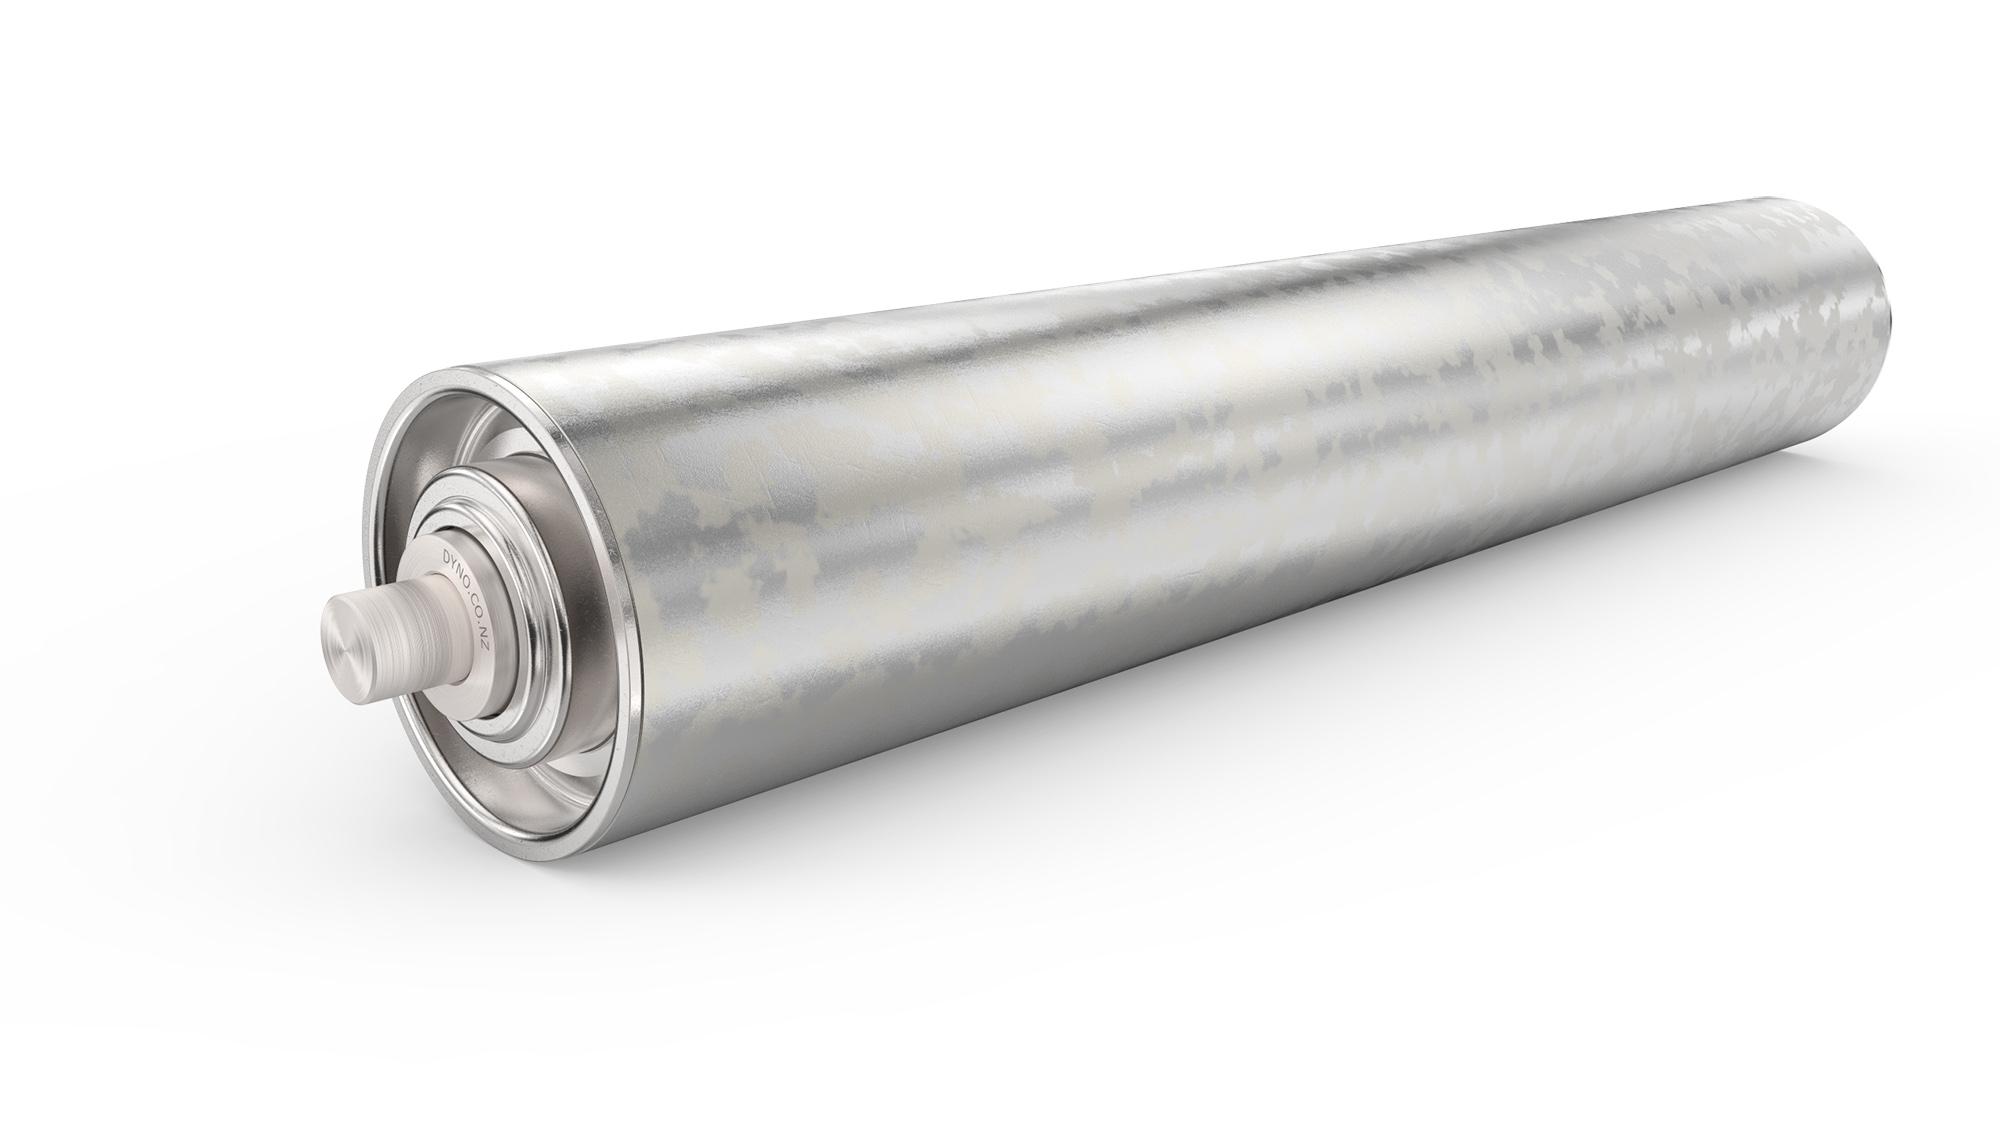 75mm Galvanized Roller | Dyno Conveyors - Roller, Belt